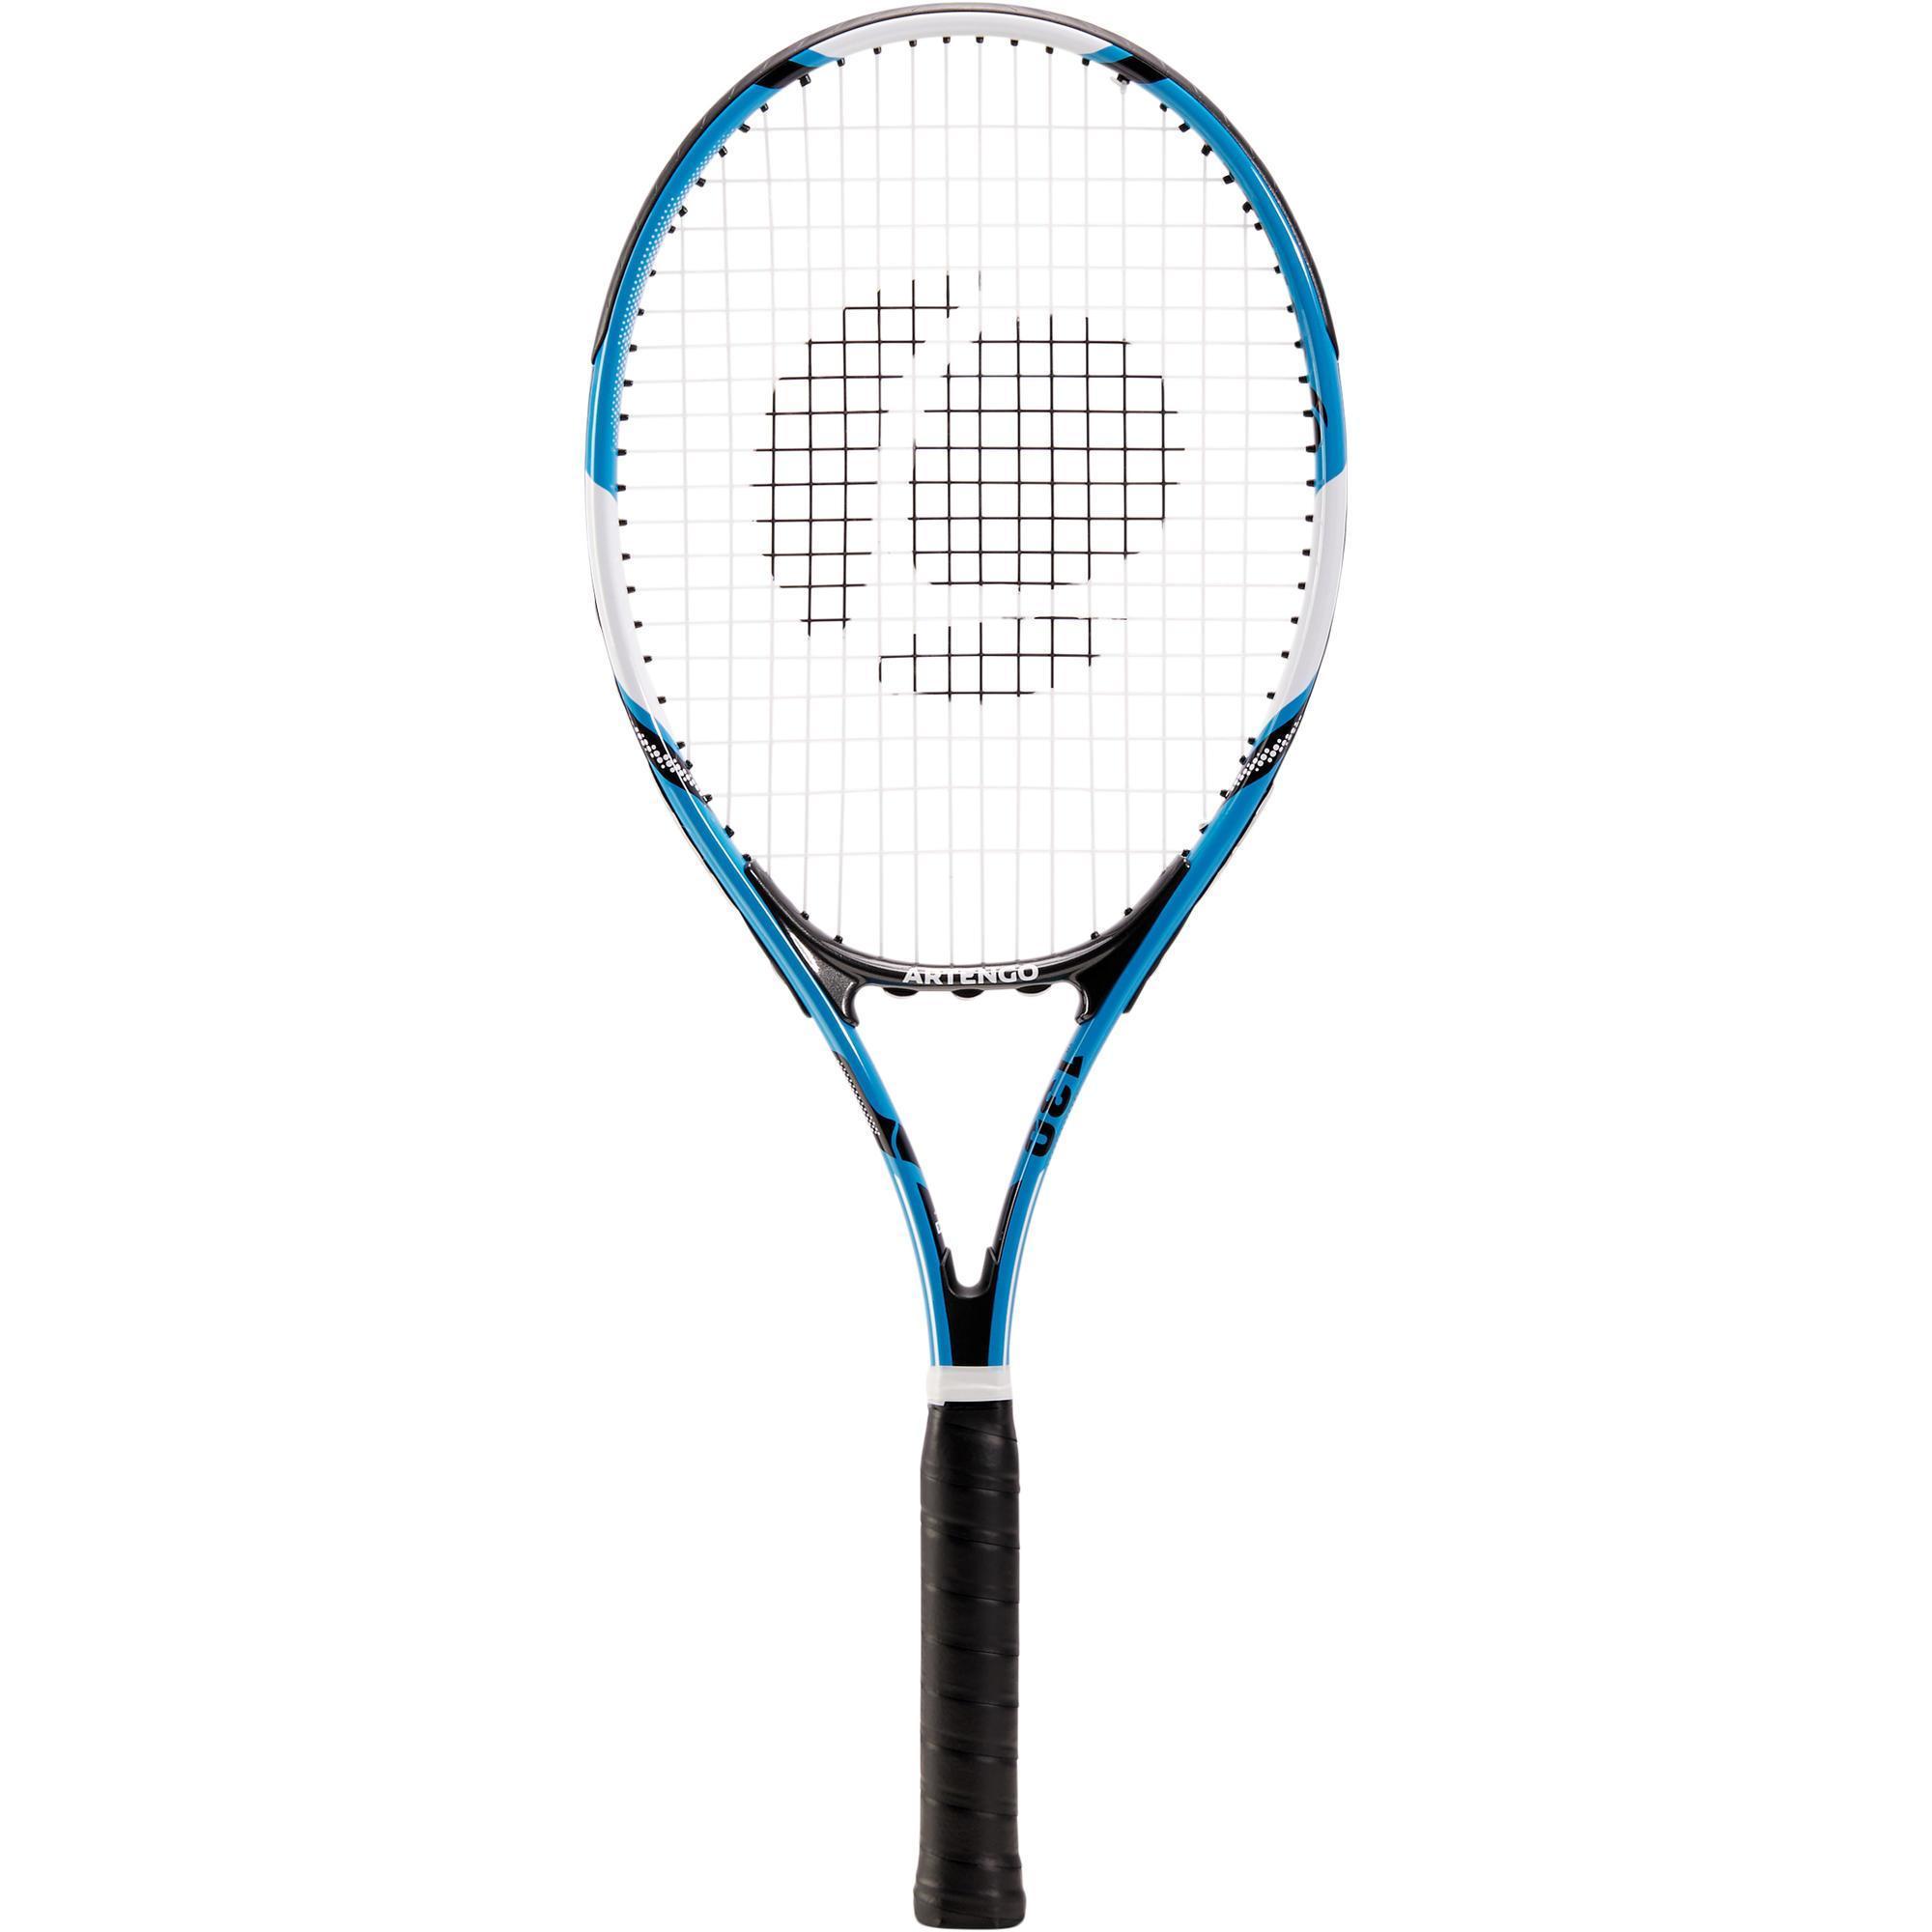 b63828b5e Comprar Raquetas de Tenis online | Decathlon